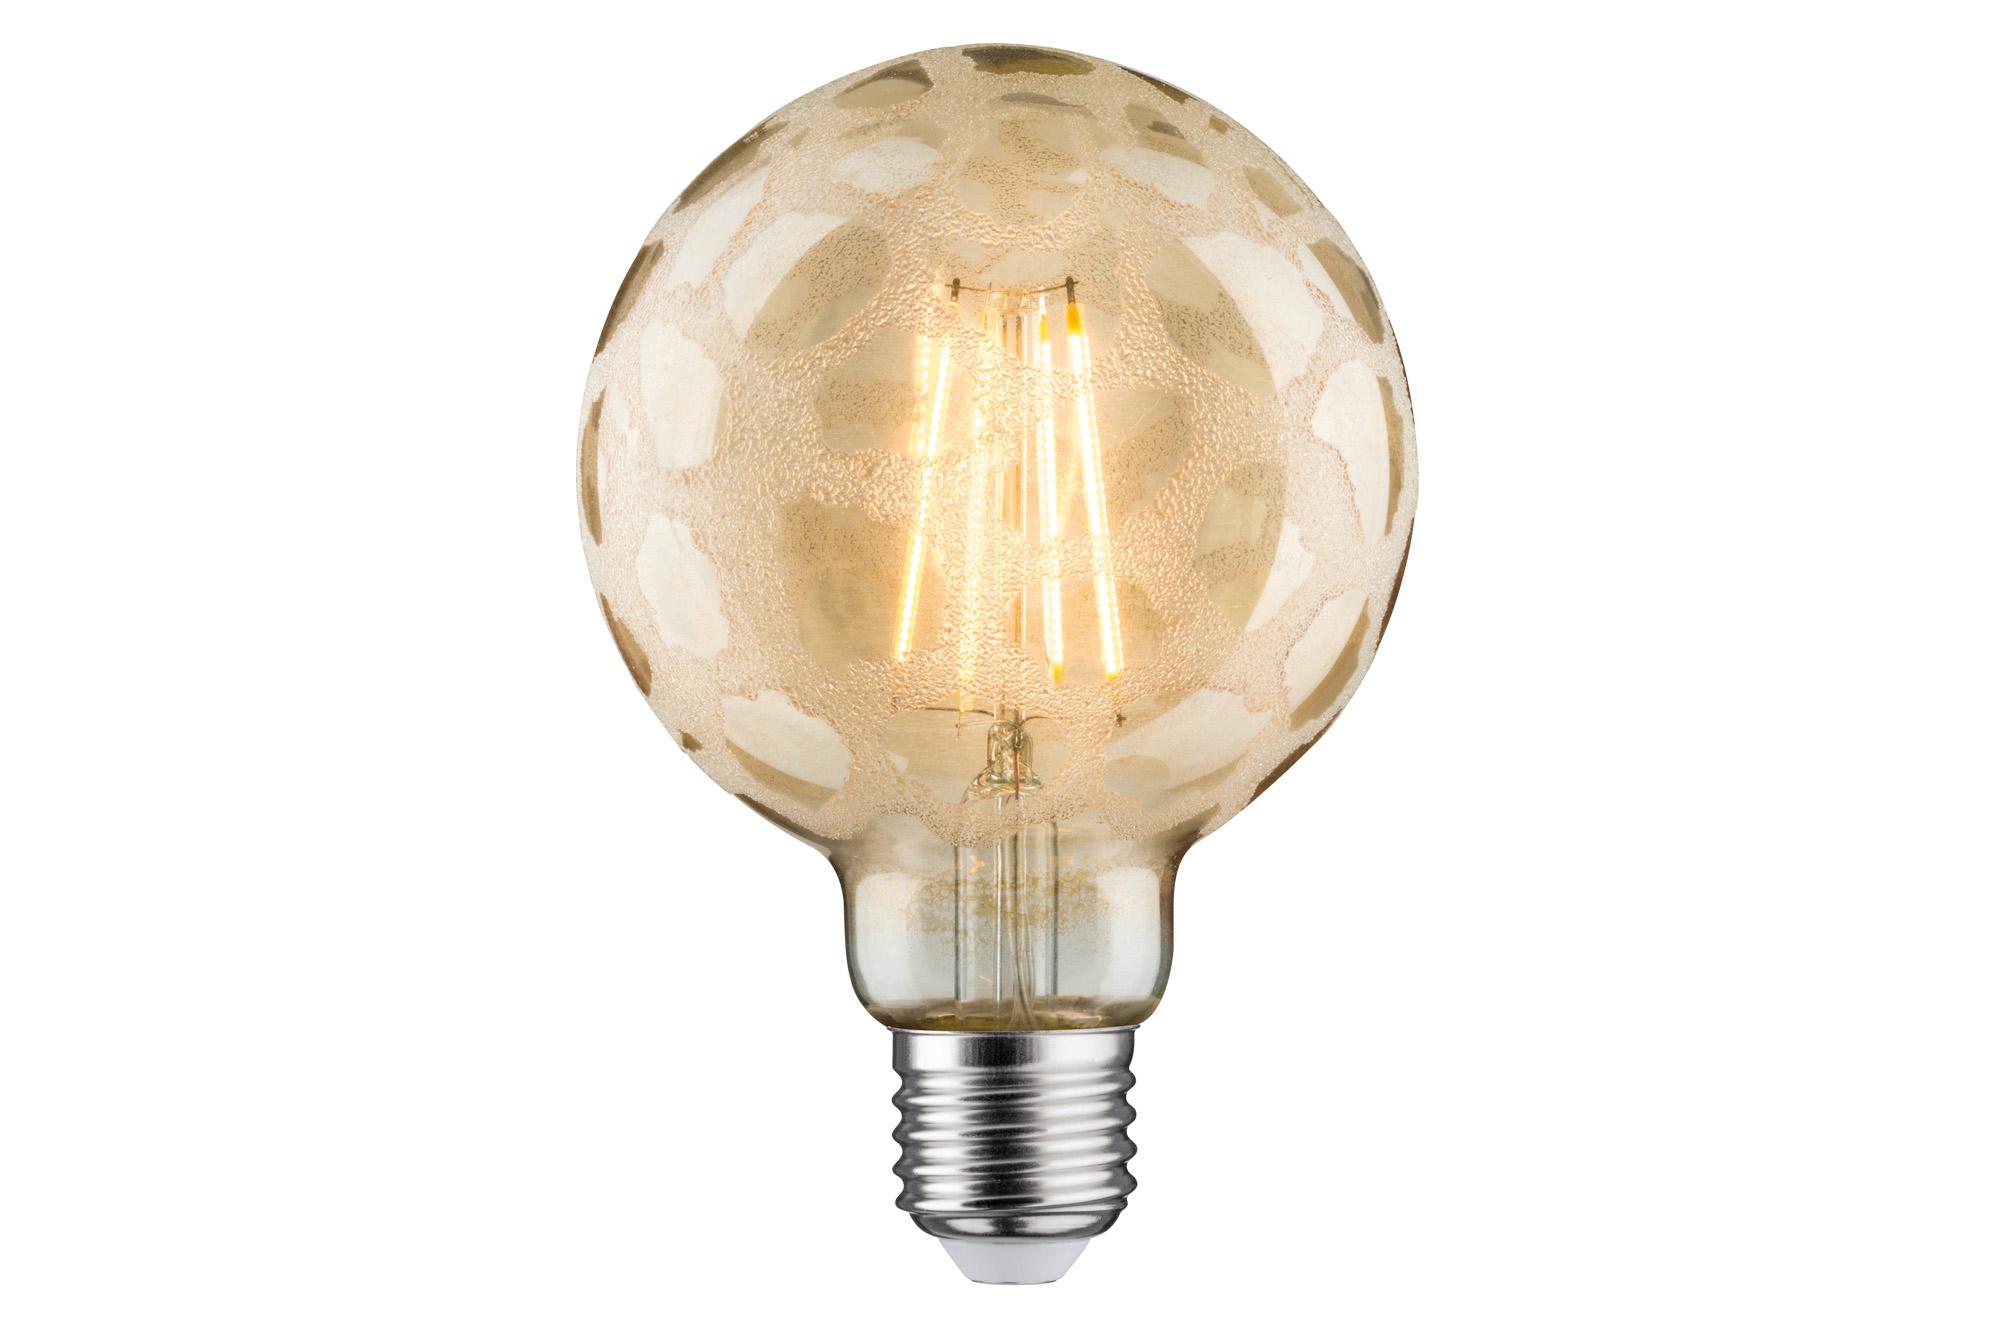 led retro globe 95 6w e27 krokoeis gold warmwei dimmbar 28488. Black Bedroom Furniture Sets. Home Design Ideas